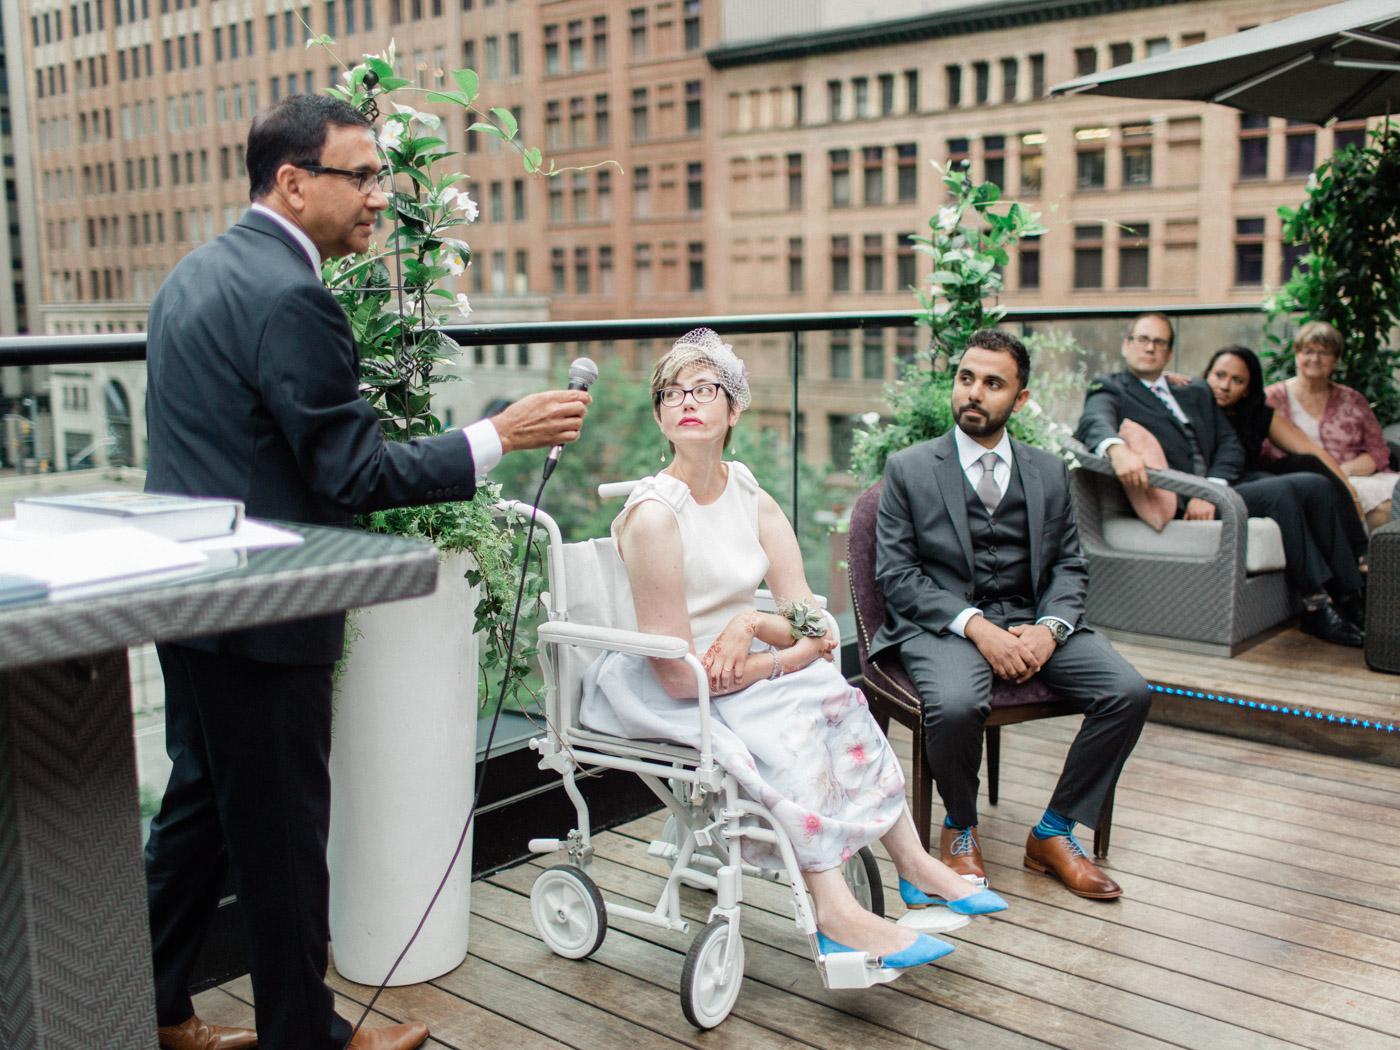 Toronto-wedding-photographer-intimate-restaurant-elopement-chase-oyster-downtown31.jpg